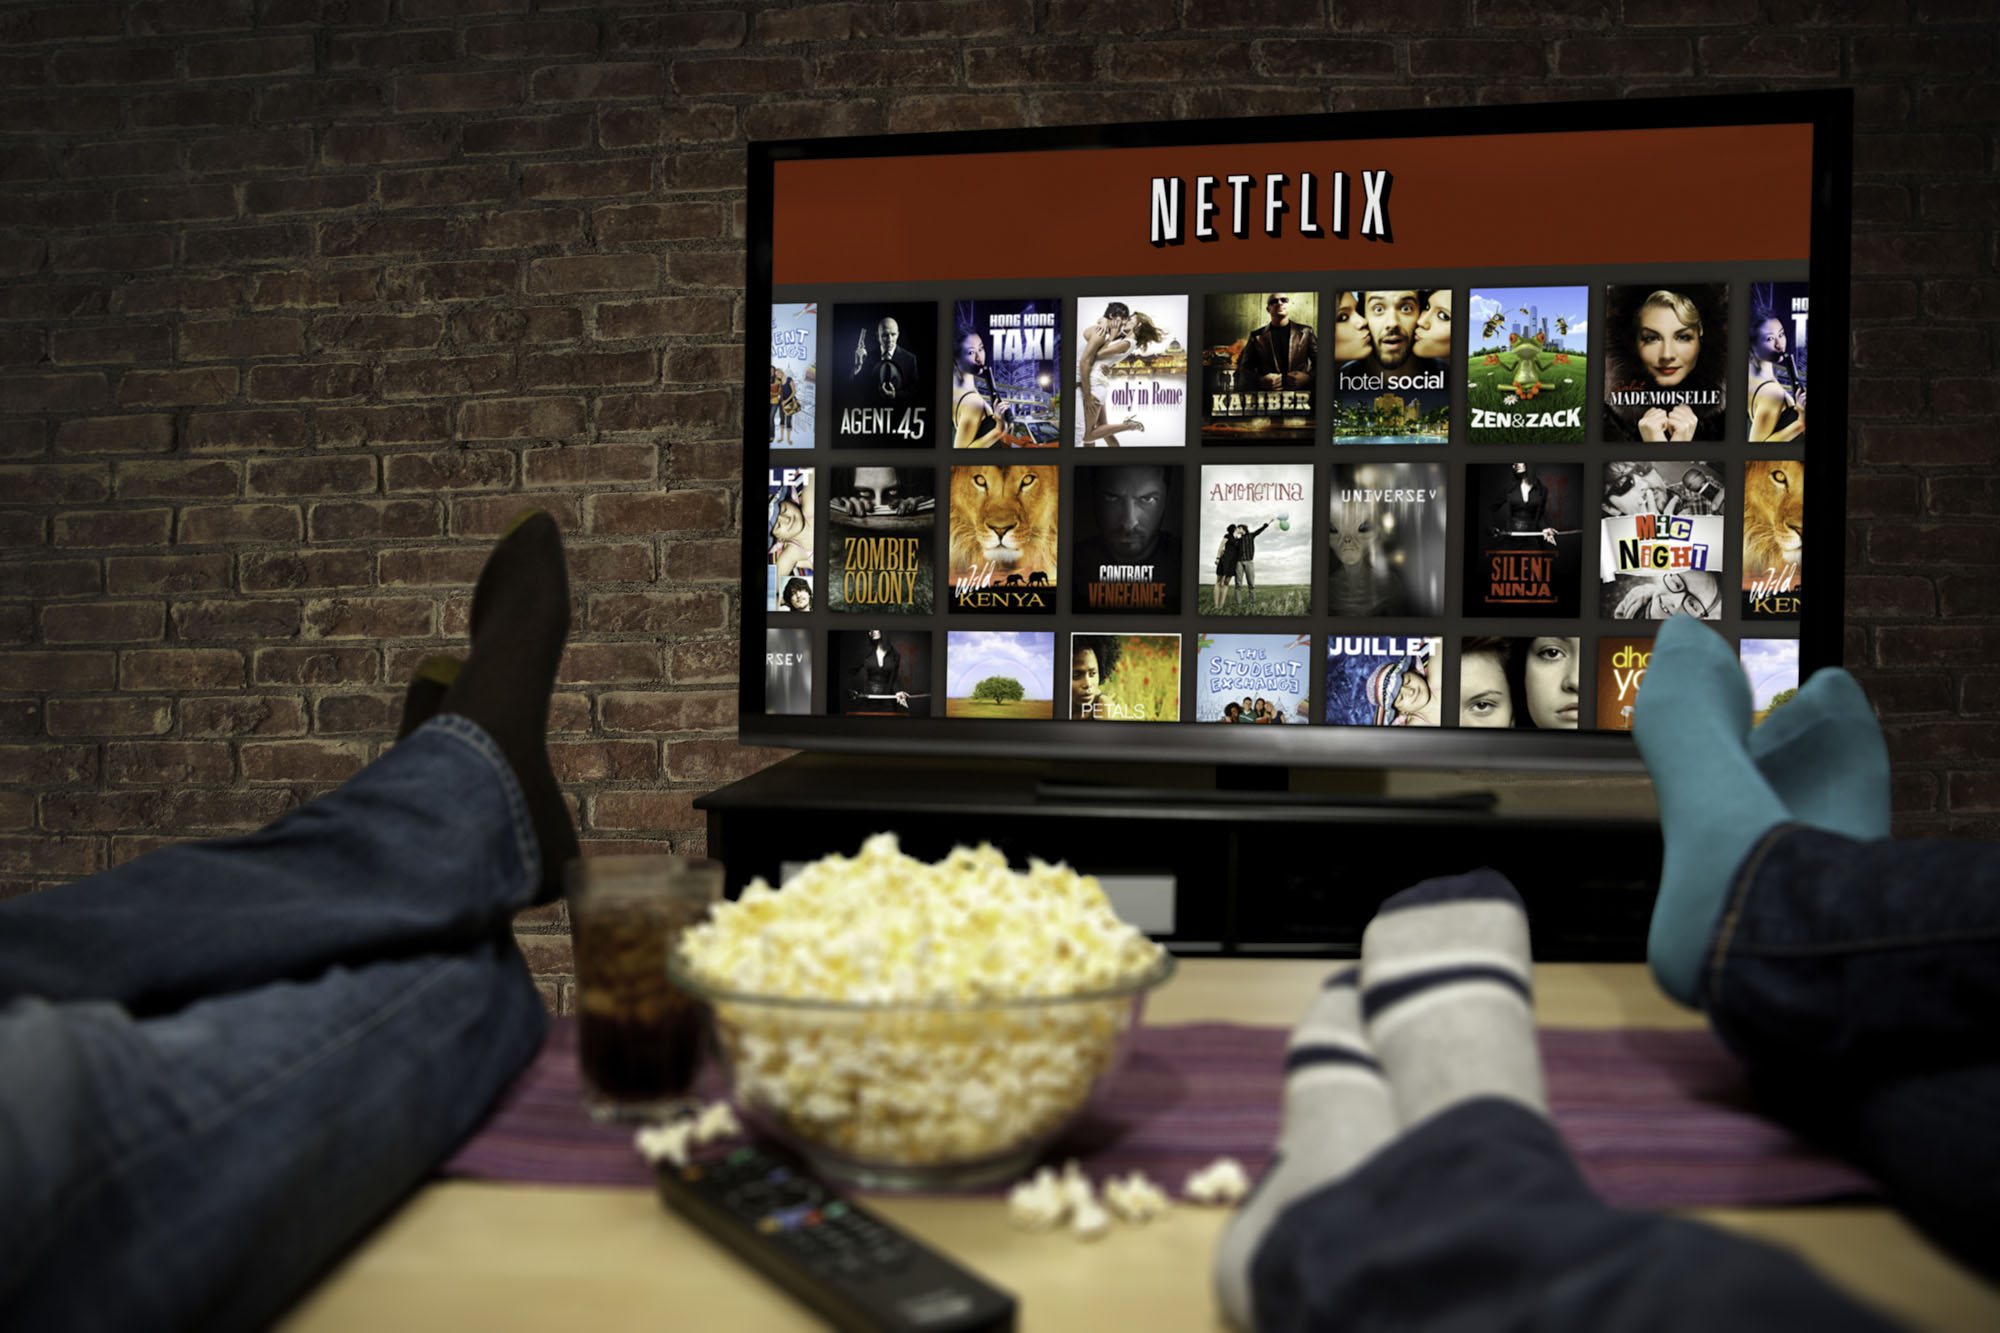 a1f67d3cee07 What can I watch in 4k Ultra HD?Used TVs